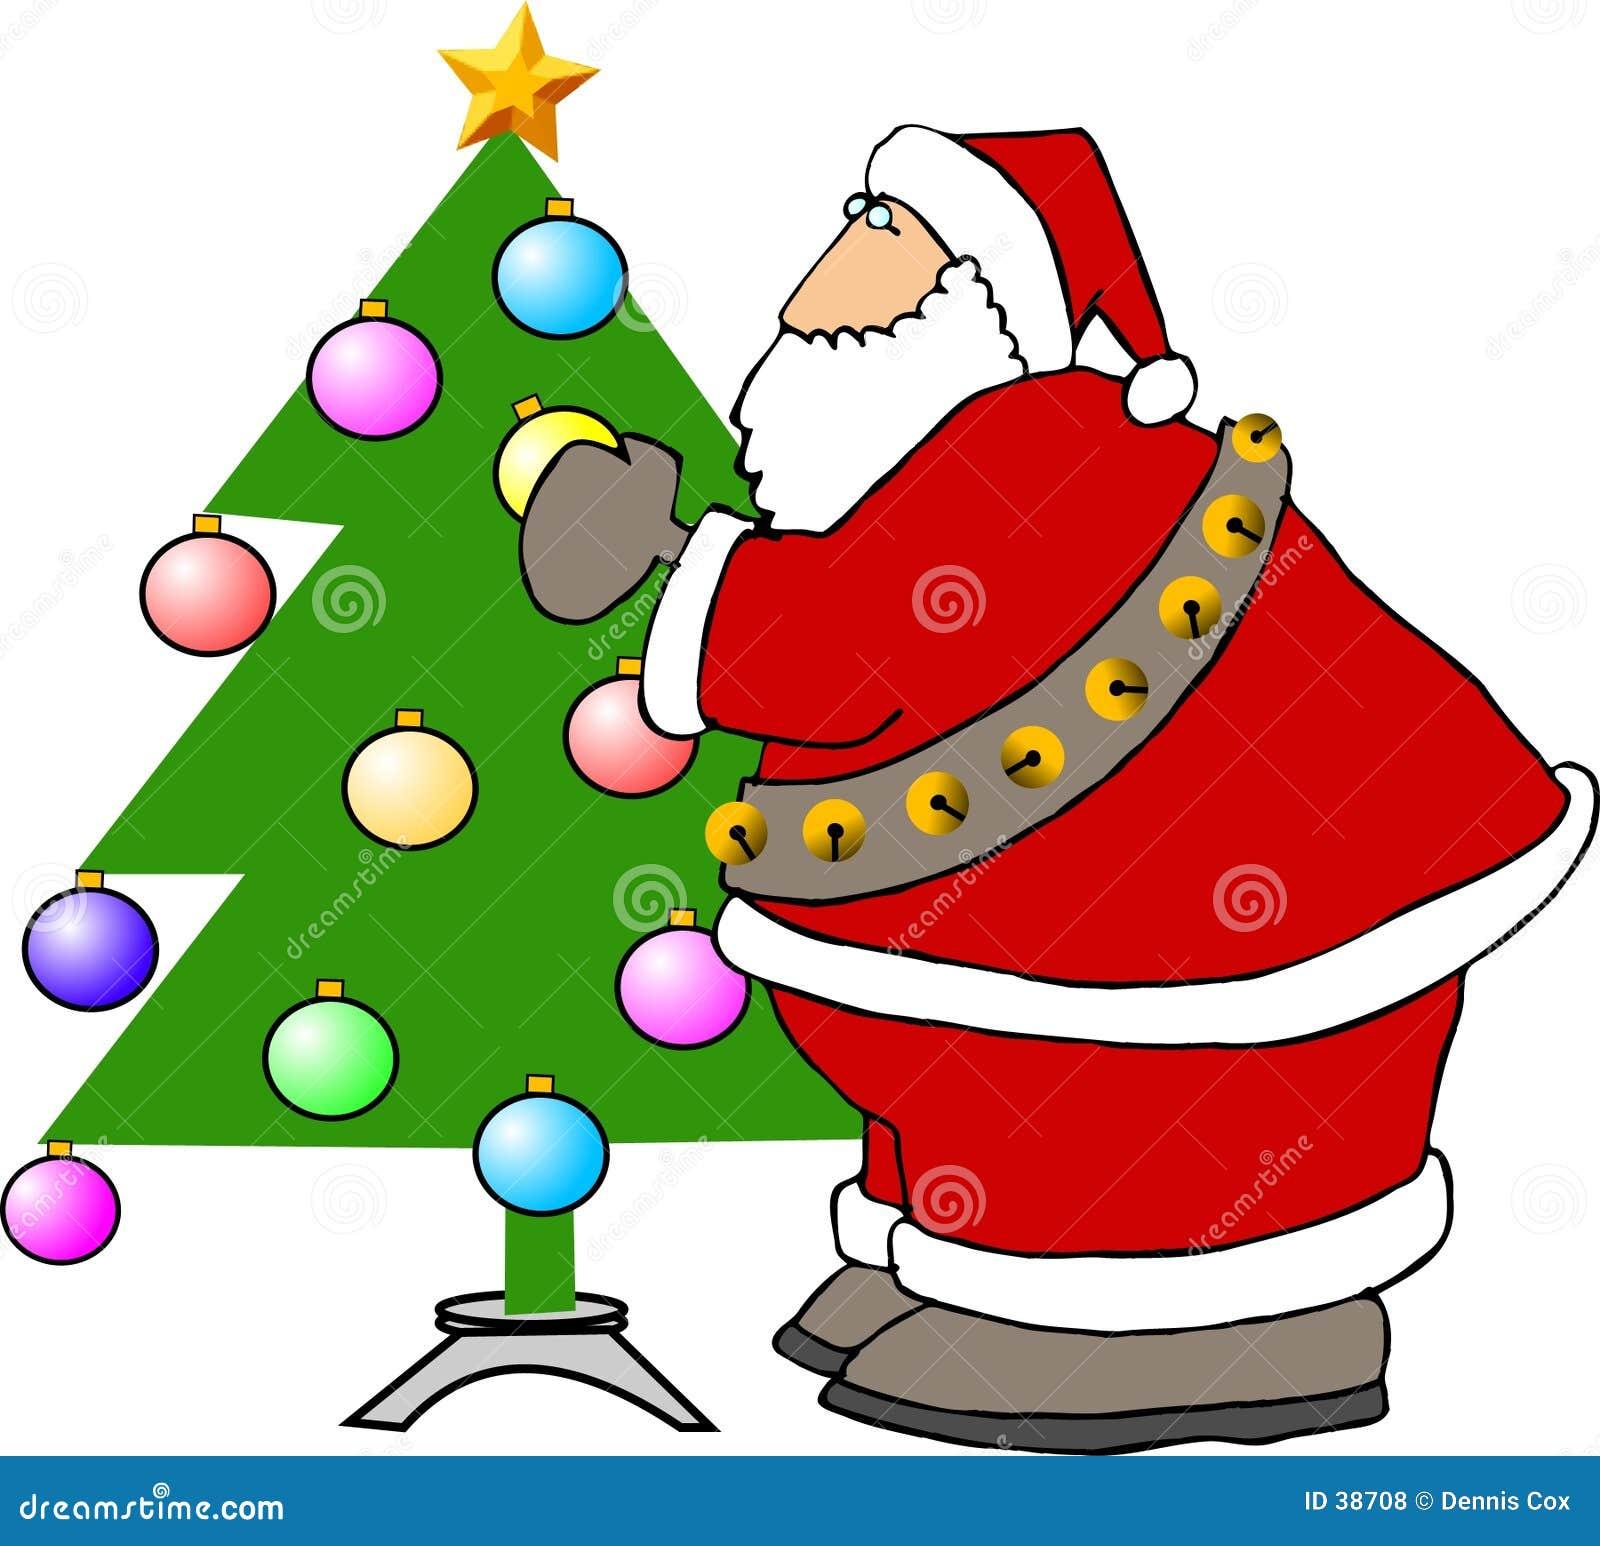 santa claus decorating a christmas tree - Santa Claus Tree